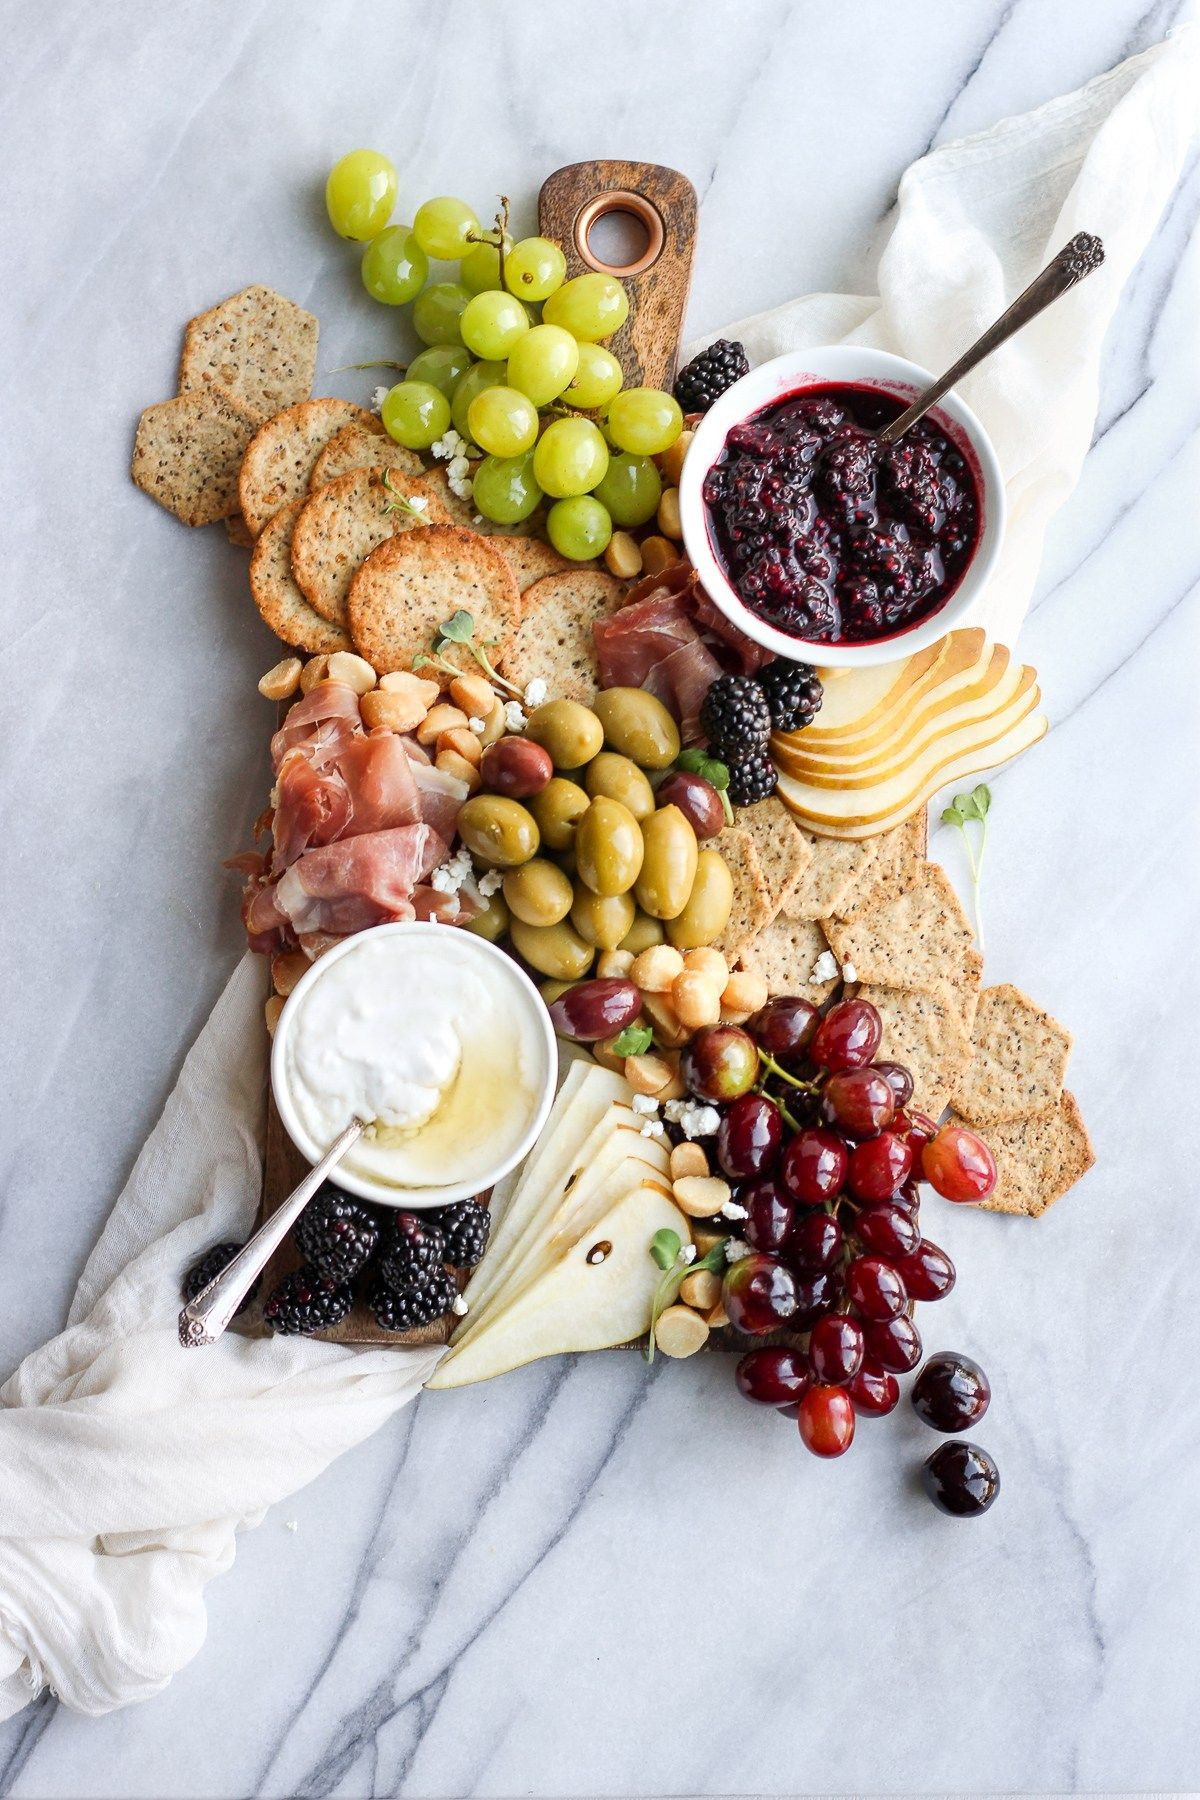 Healthy GrainFree/GlutenFree Charcuterie Board Recipe